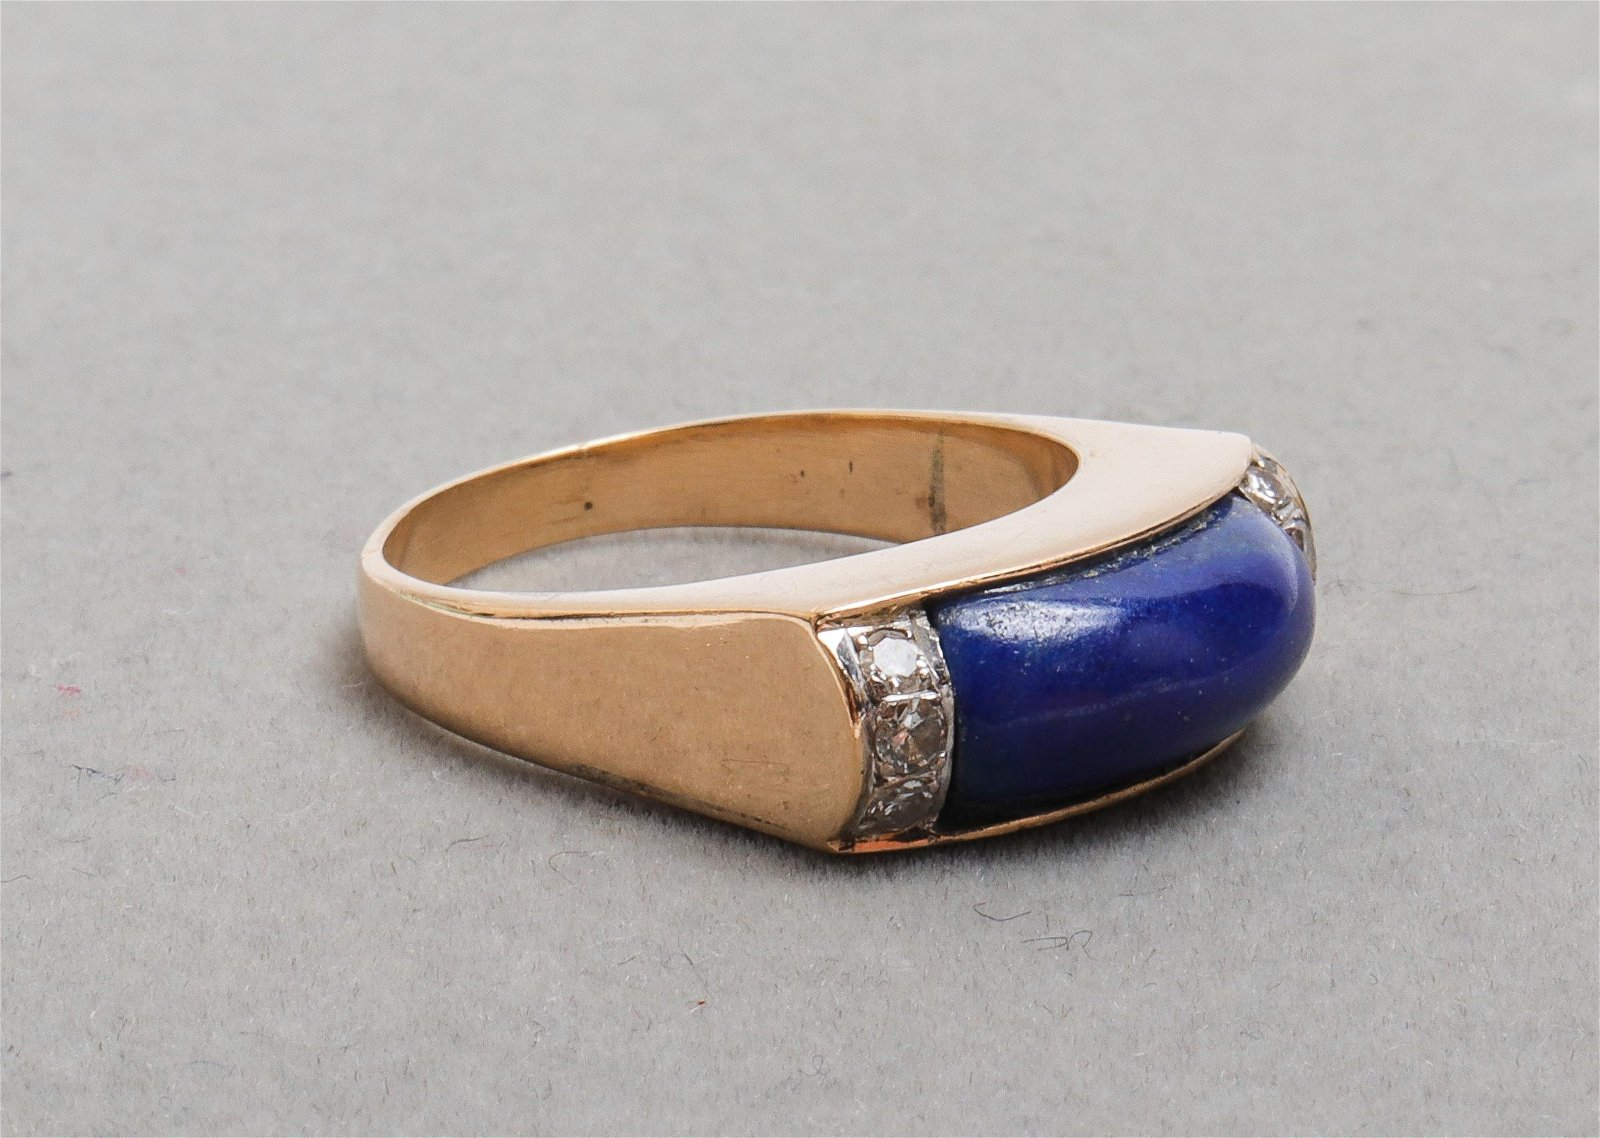 Vintage 14K Yellow Gold Lapis & Diamond Ring